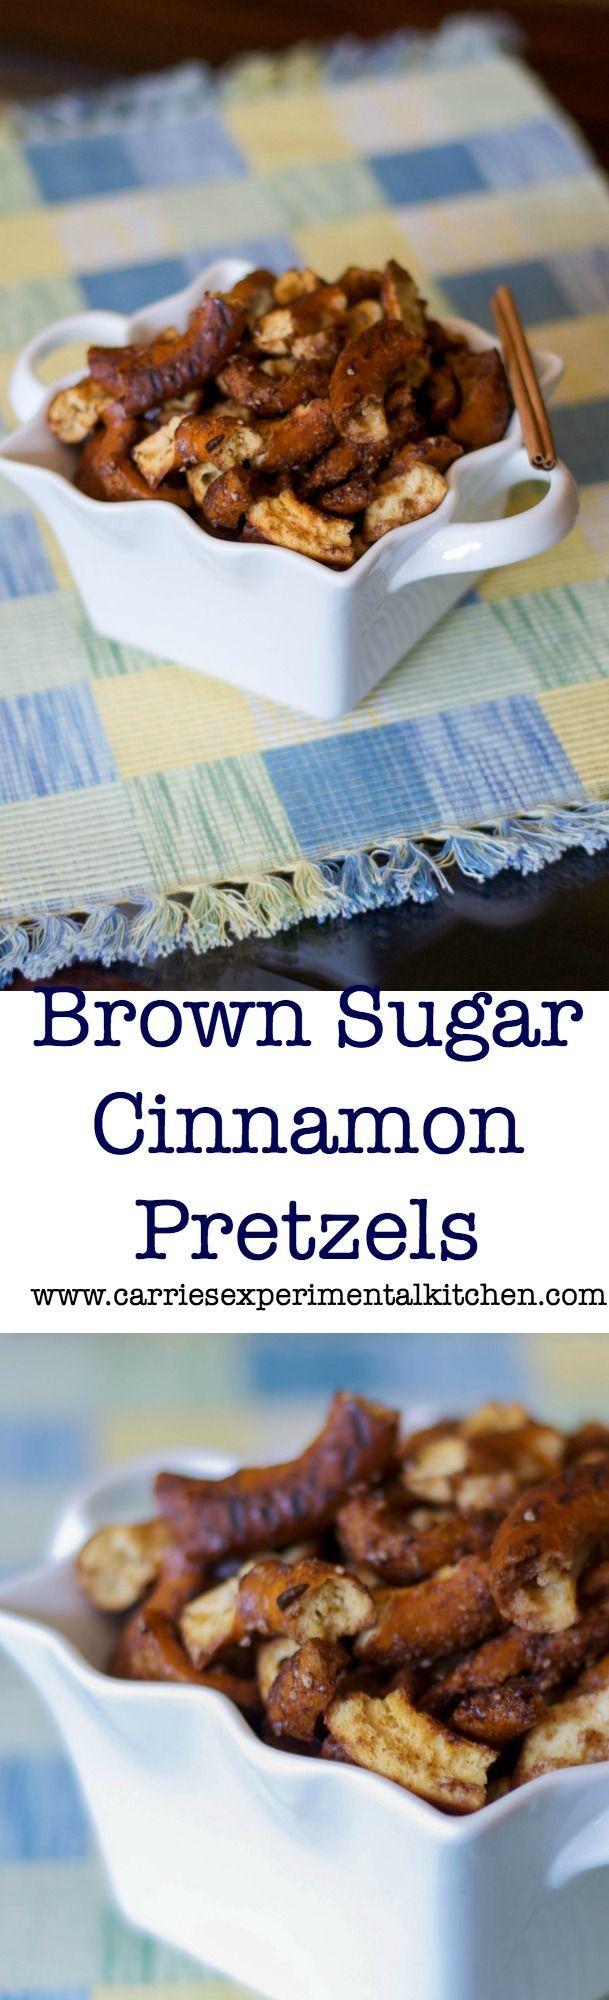 Brown Sugar and Cinnamon Pretzels